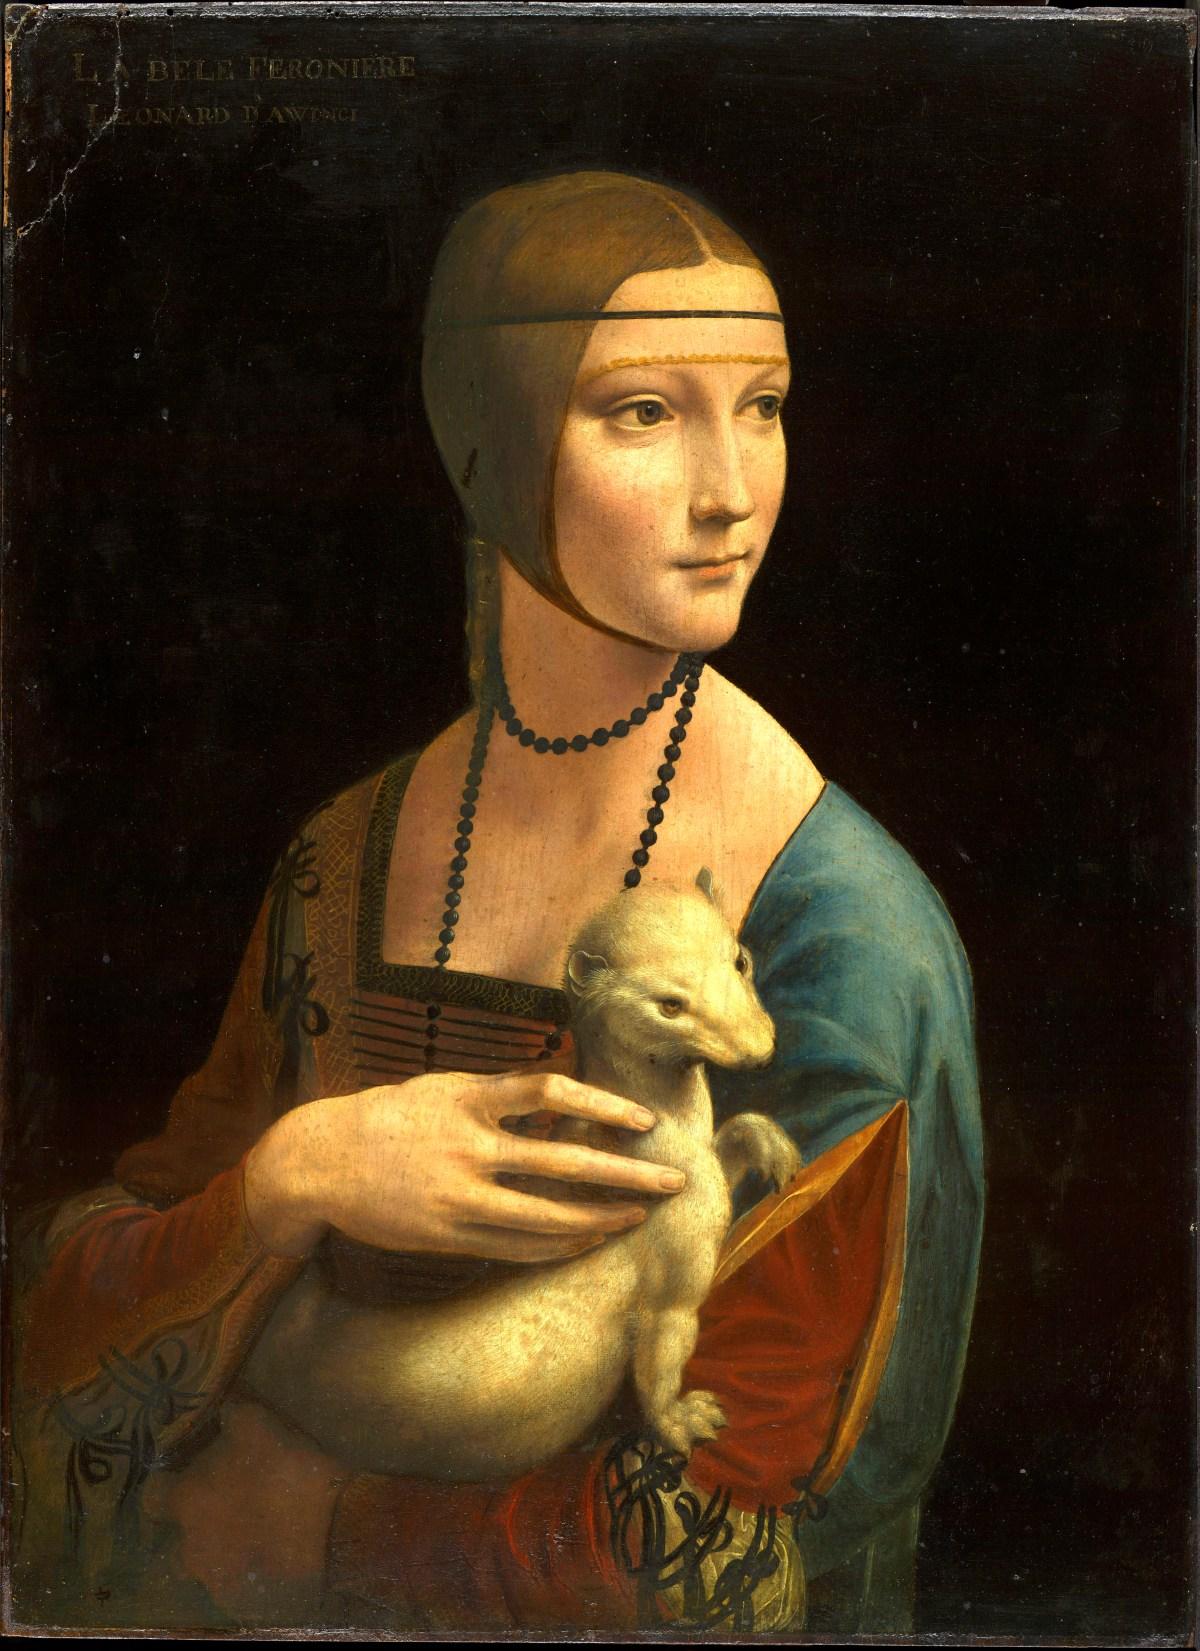 Lady with an Ermine by Leonardo da Vinci